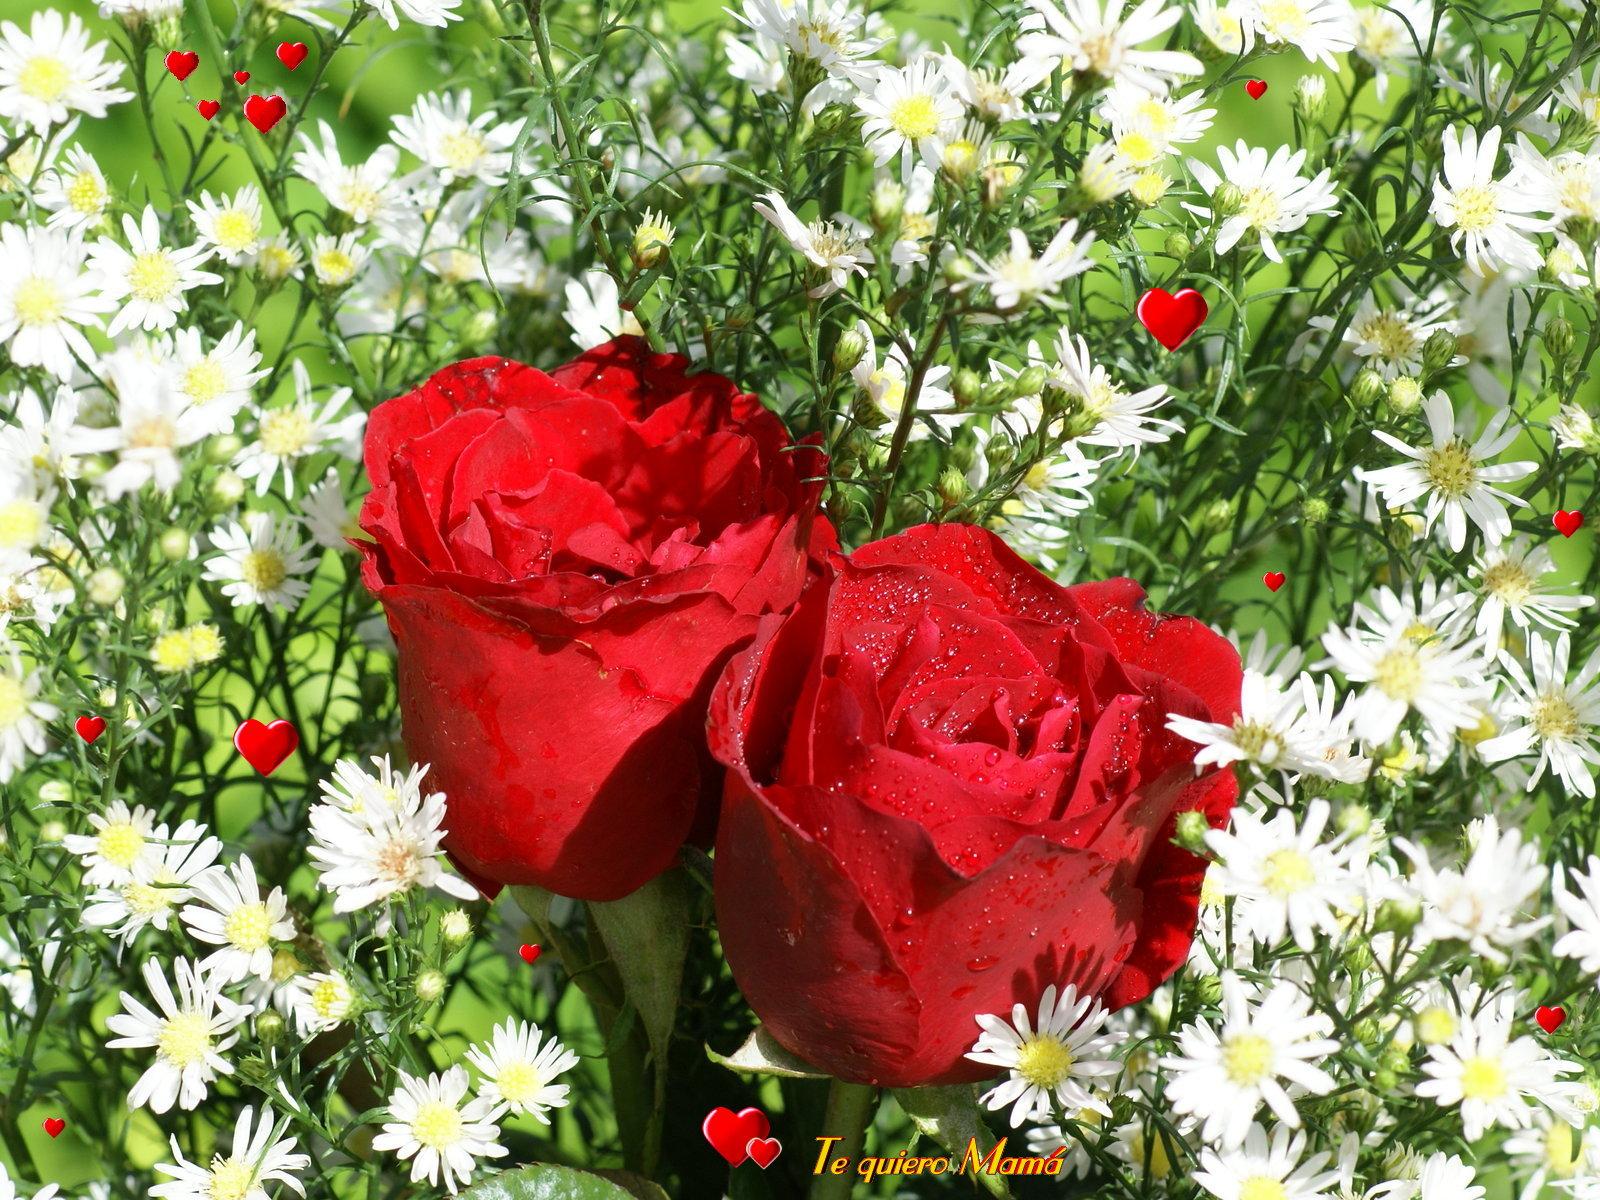 Fondos dia de la madre - Rosas rojas